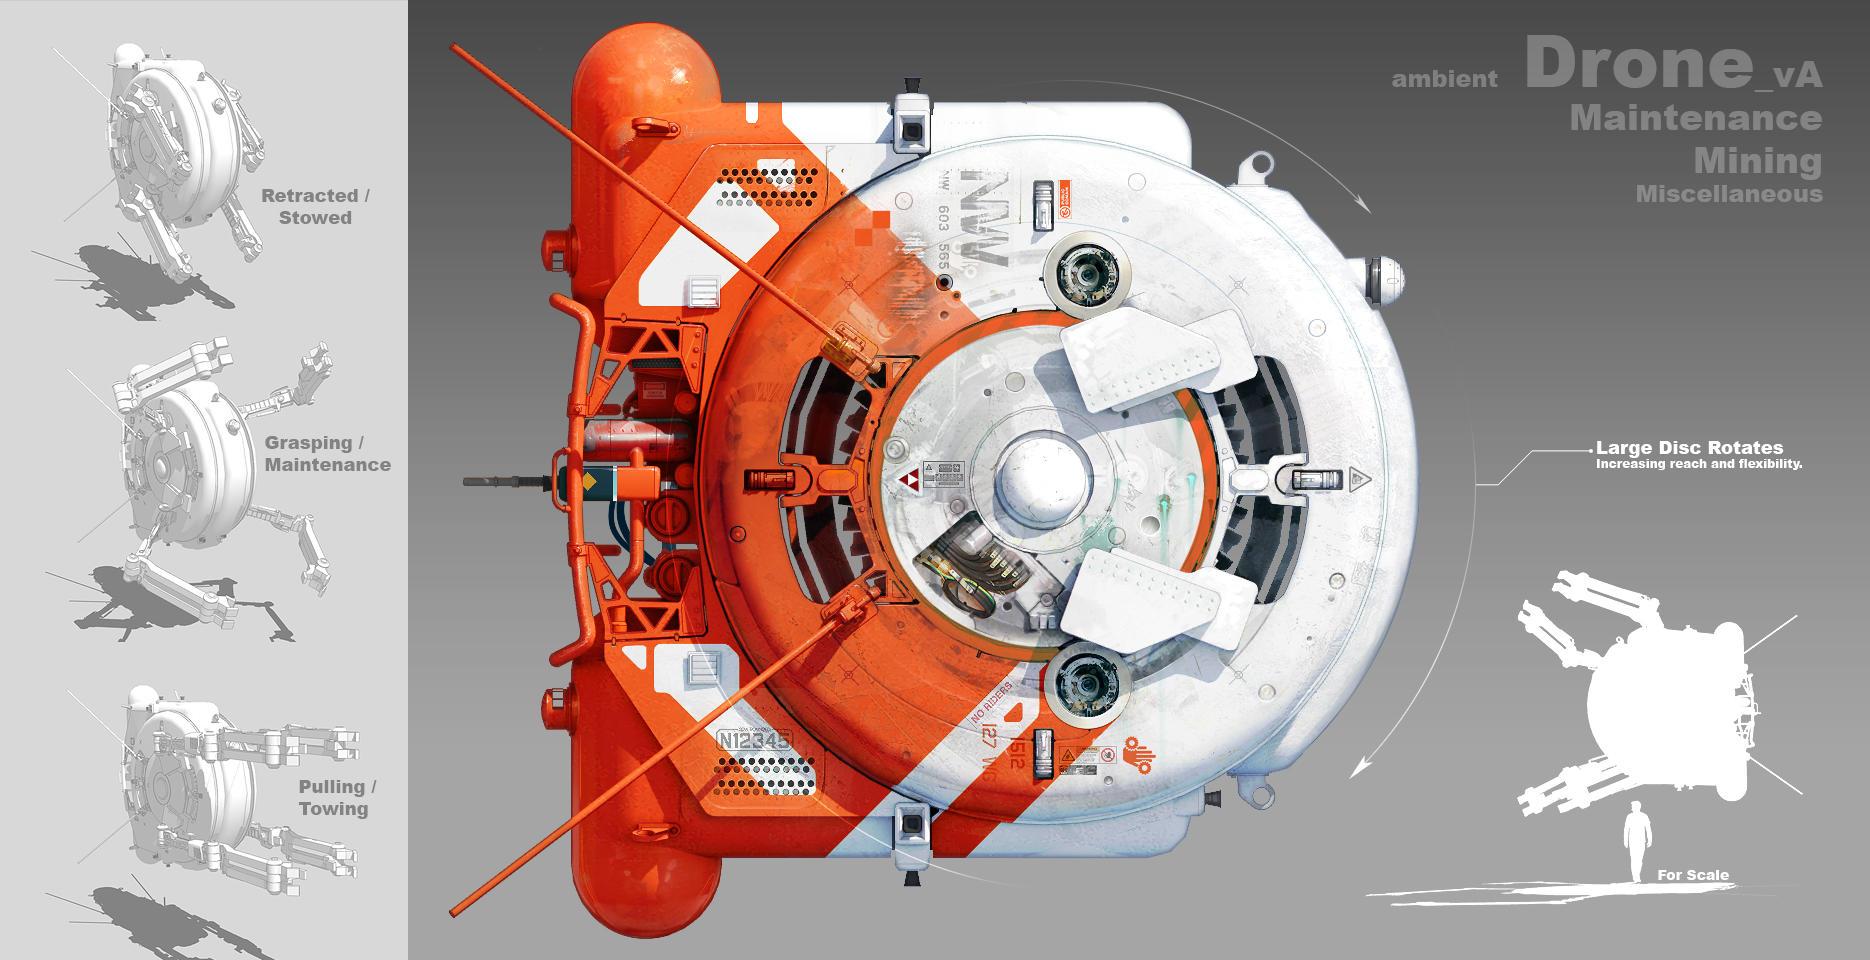 ORION Maintenance Drone vA